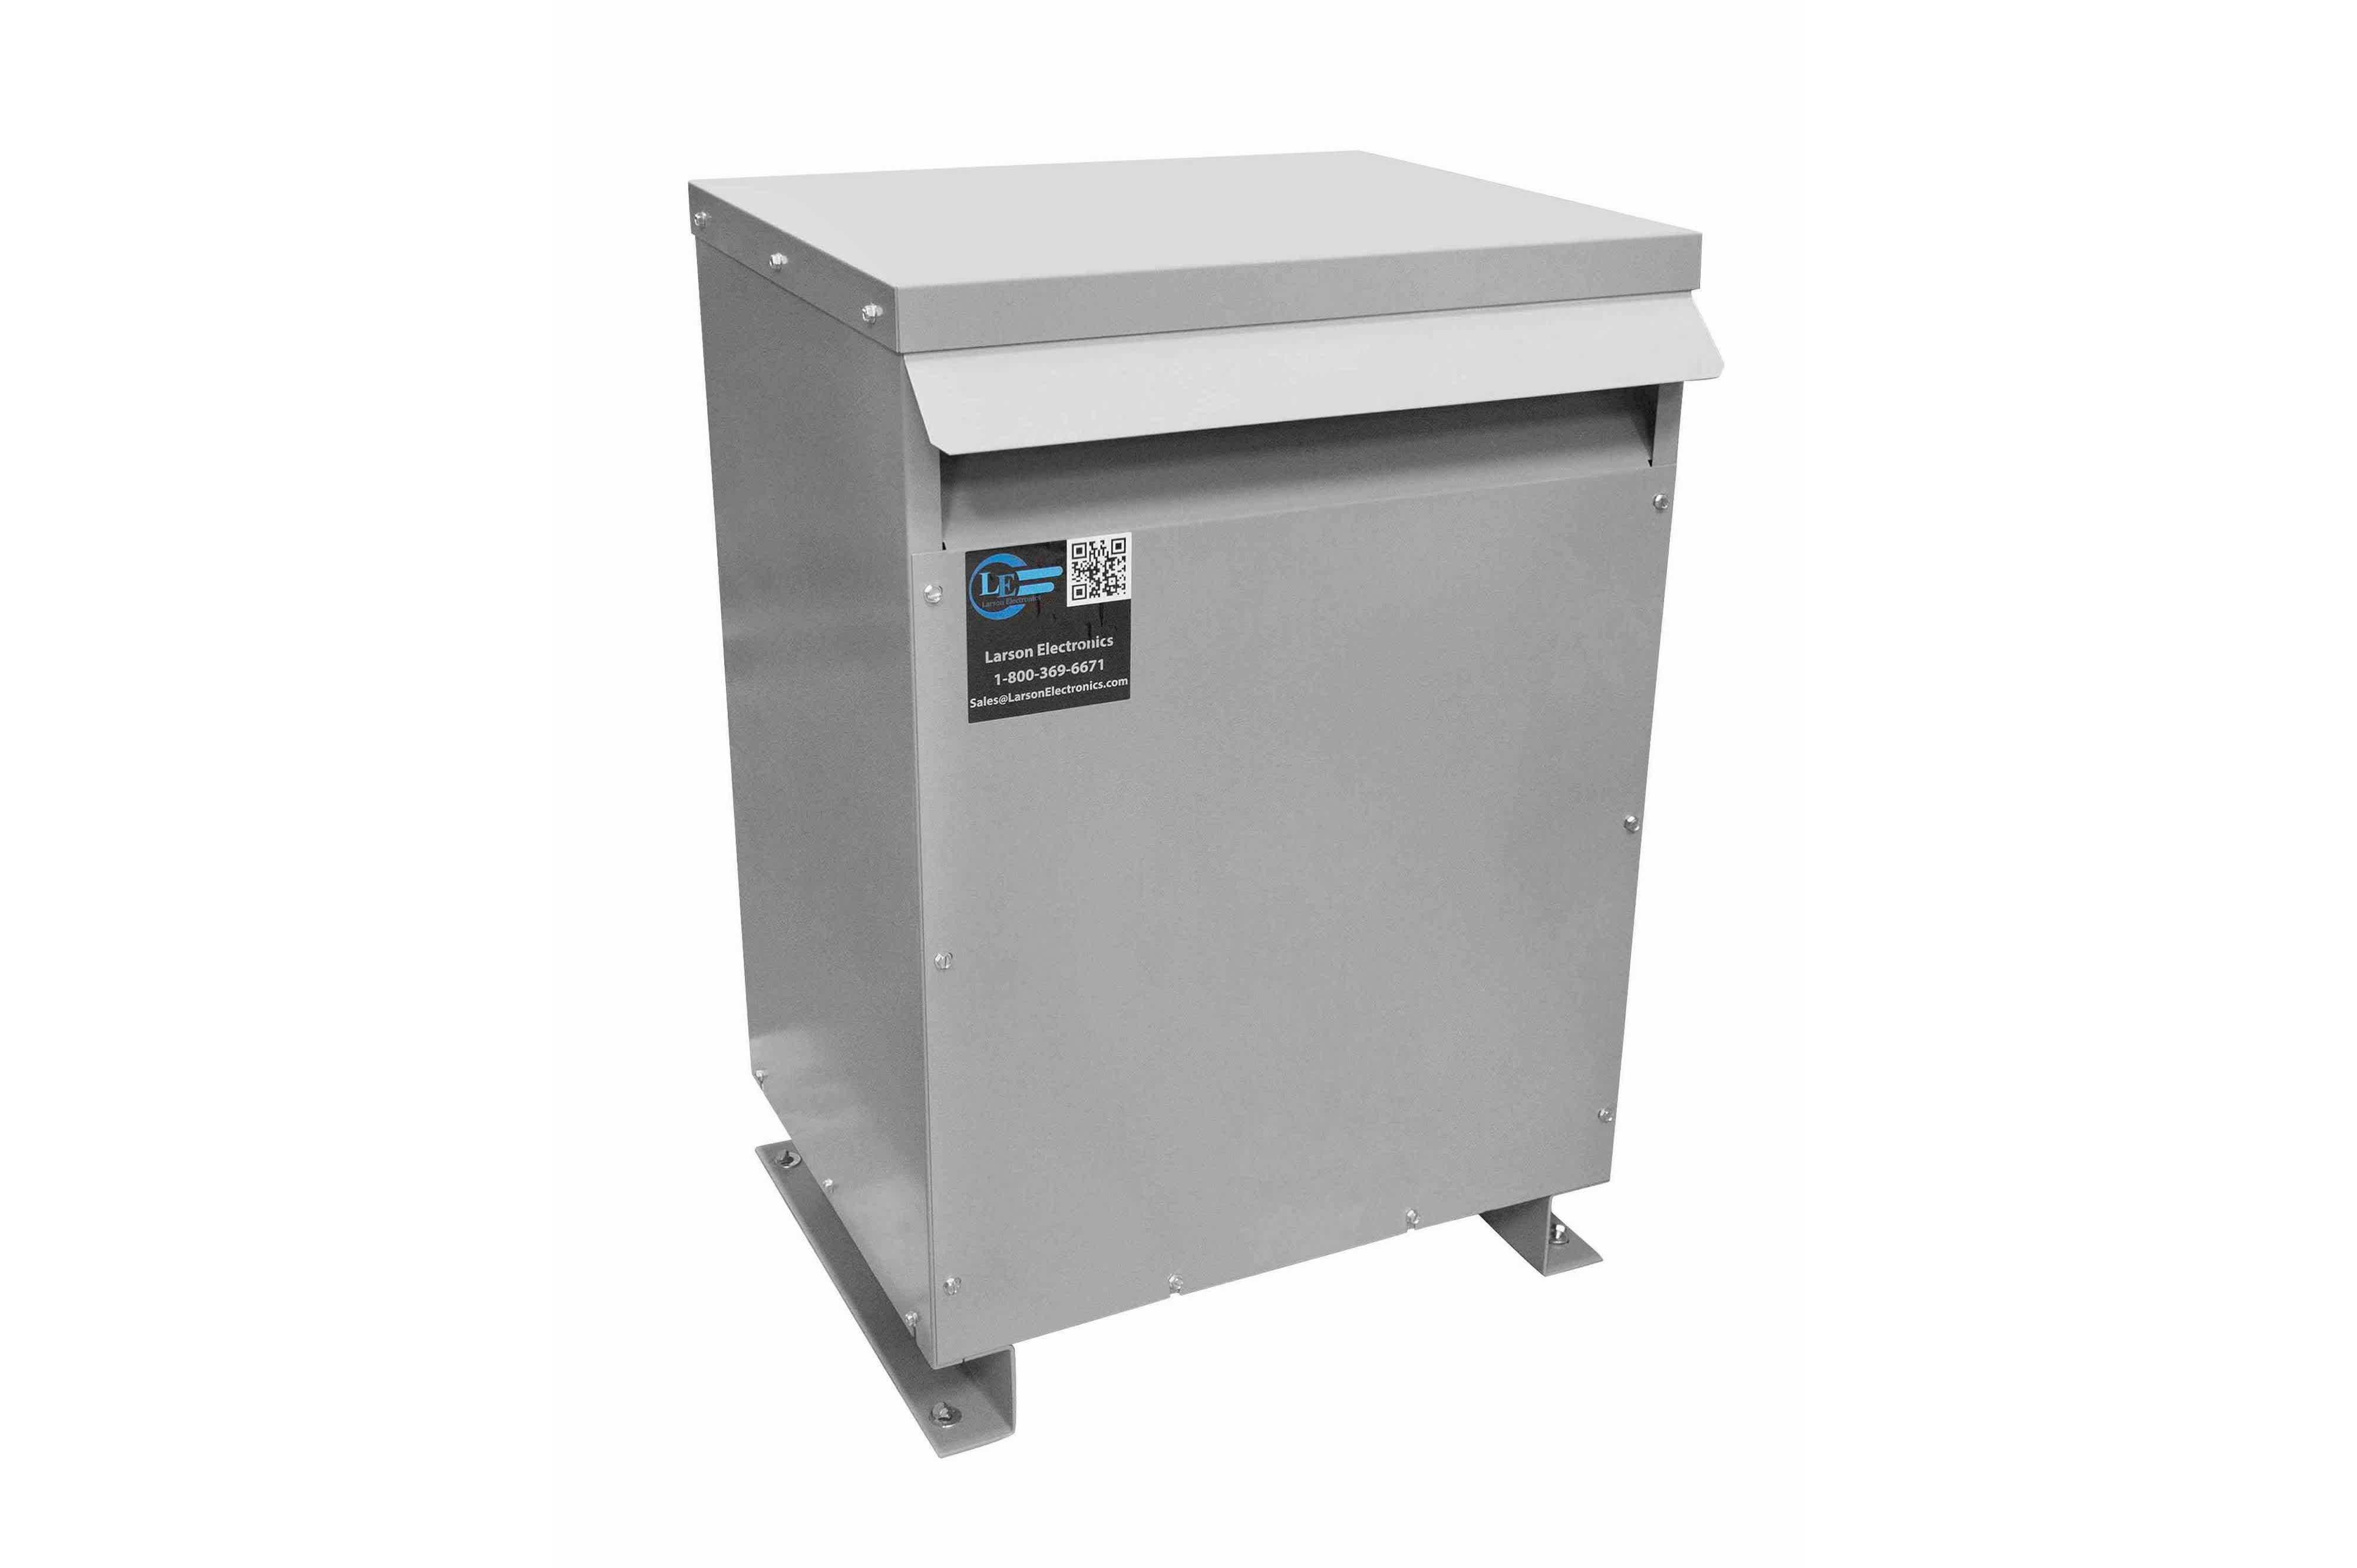 167 kVA 3PH Isolation Transformer, 460V Wye Primary, 415V Delta Secondary, N3R, Ventilated, 60 Hz